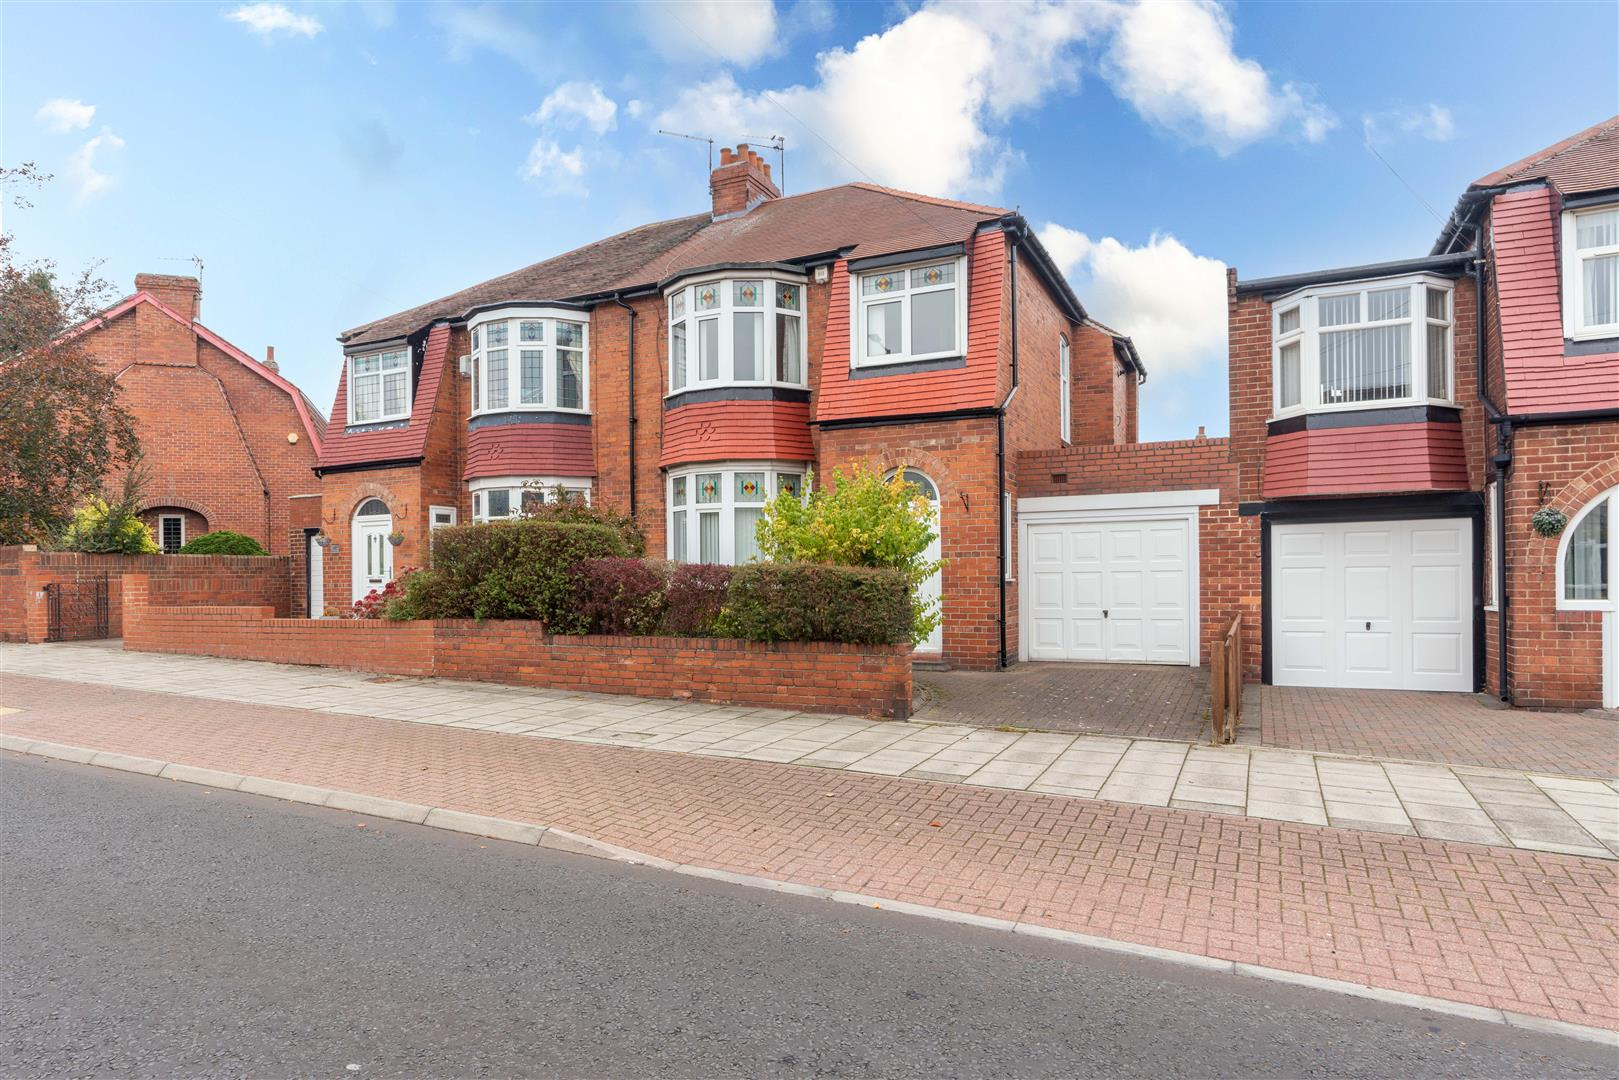 3 bed semi-detached house for sale in Kenton Lane, Newcastle Upon Tyne, NE3